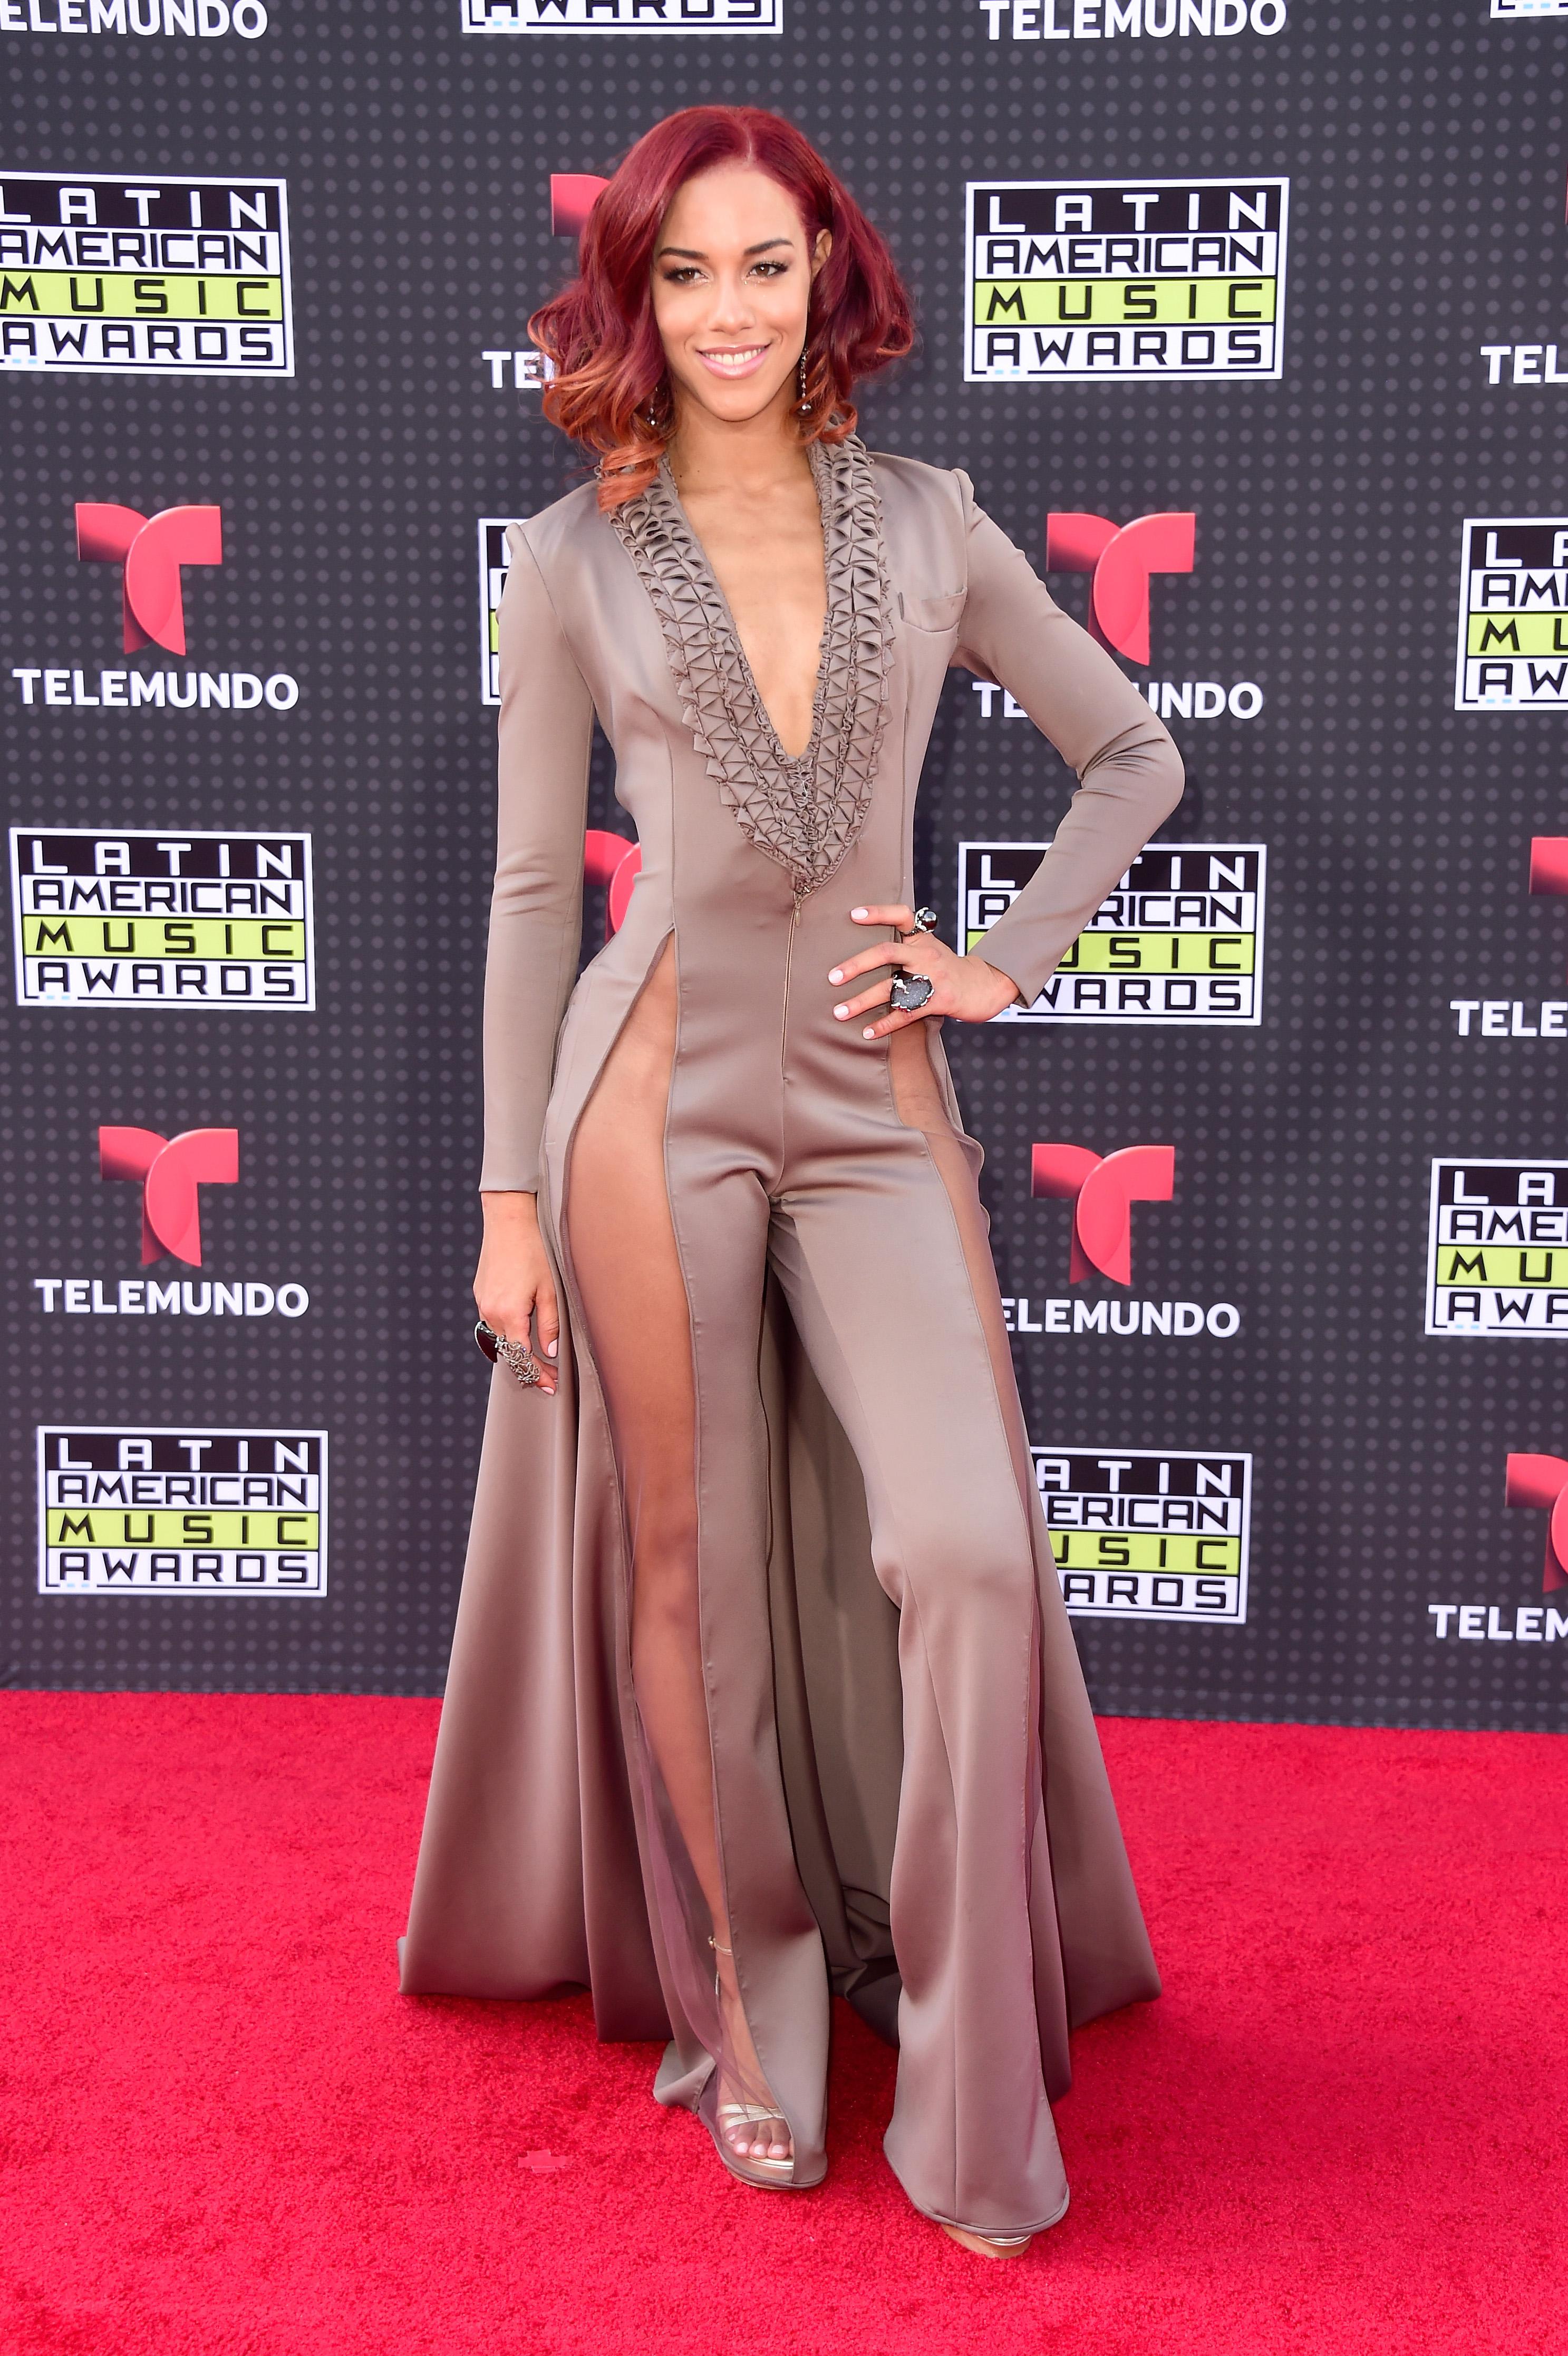 Telemundo's Latin American Music Awards 2015 - Arrivals